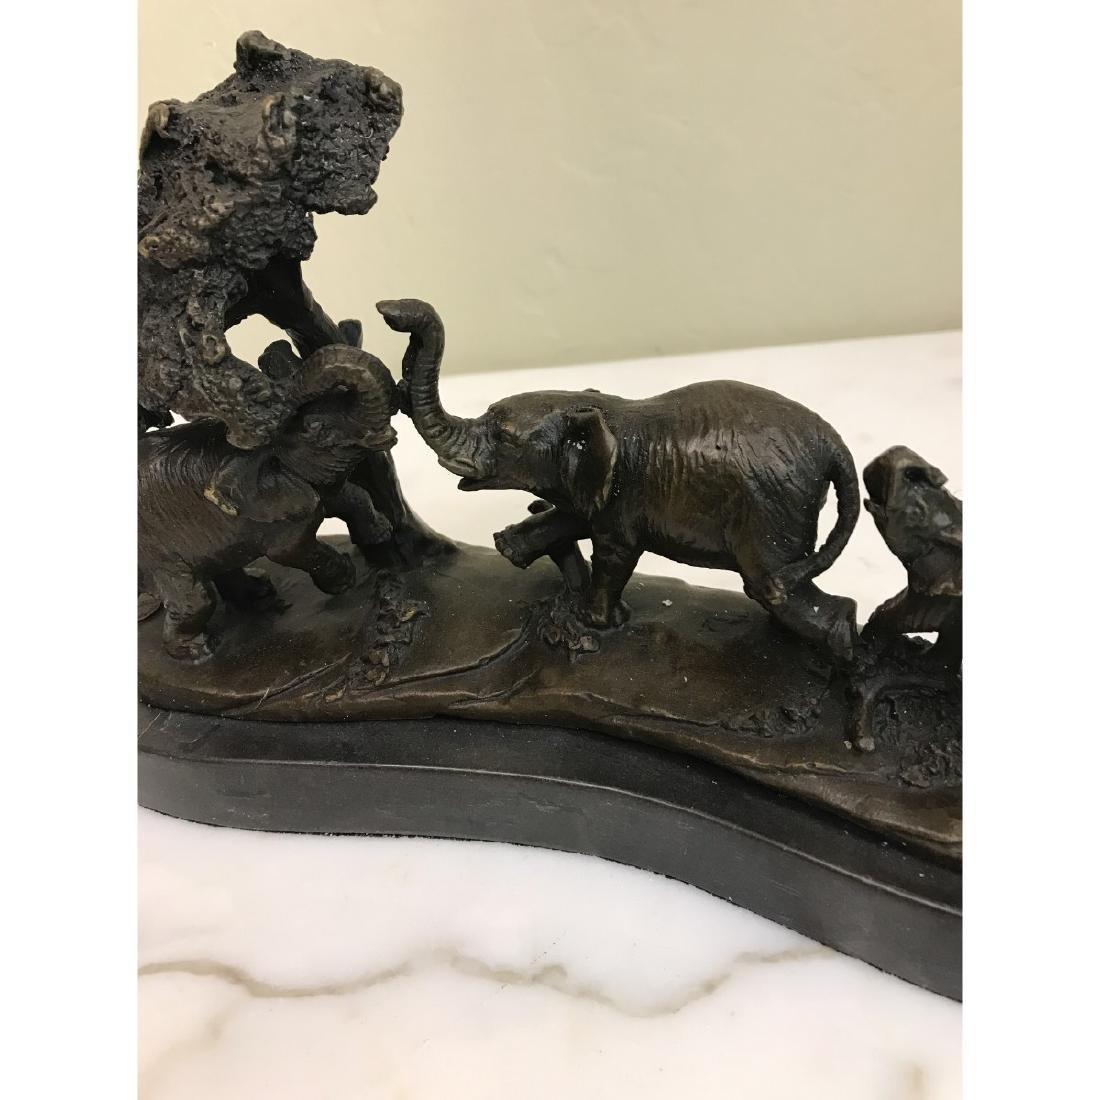 Miniature Bronze Statue of Group of Elephants - 9